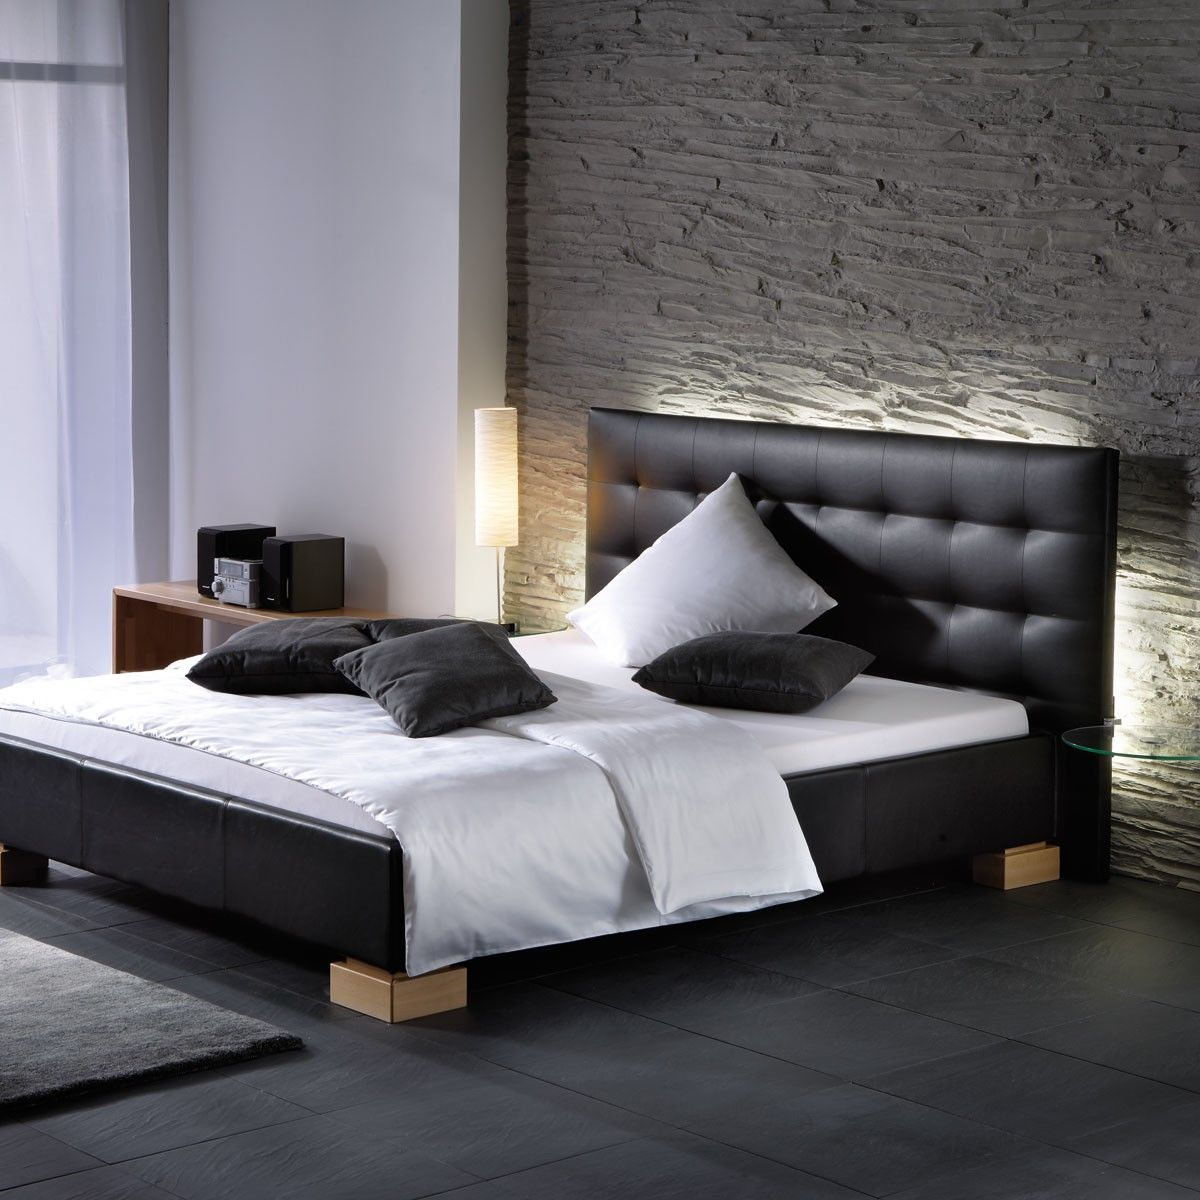 Billig Betten Shop Möbelideen Pinterest Bett Schlafzimmer Und